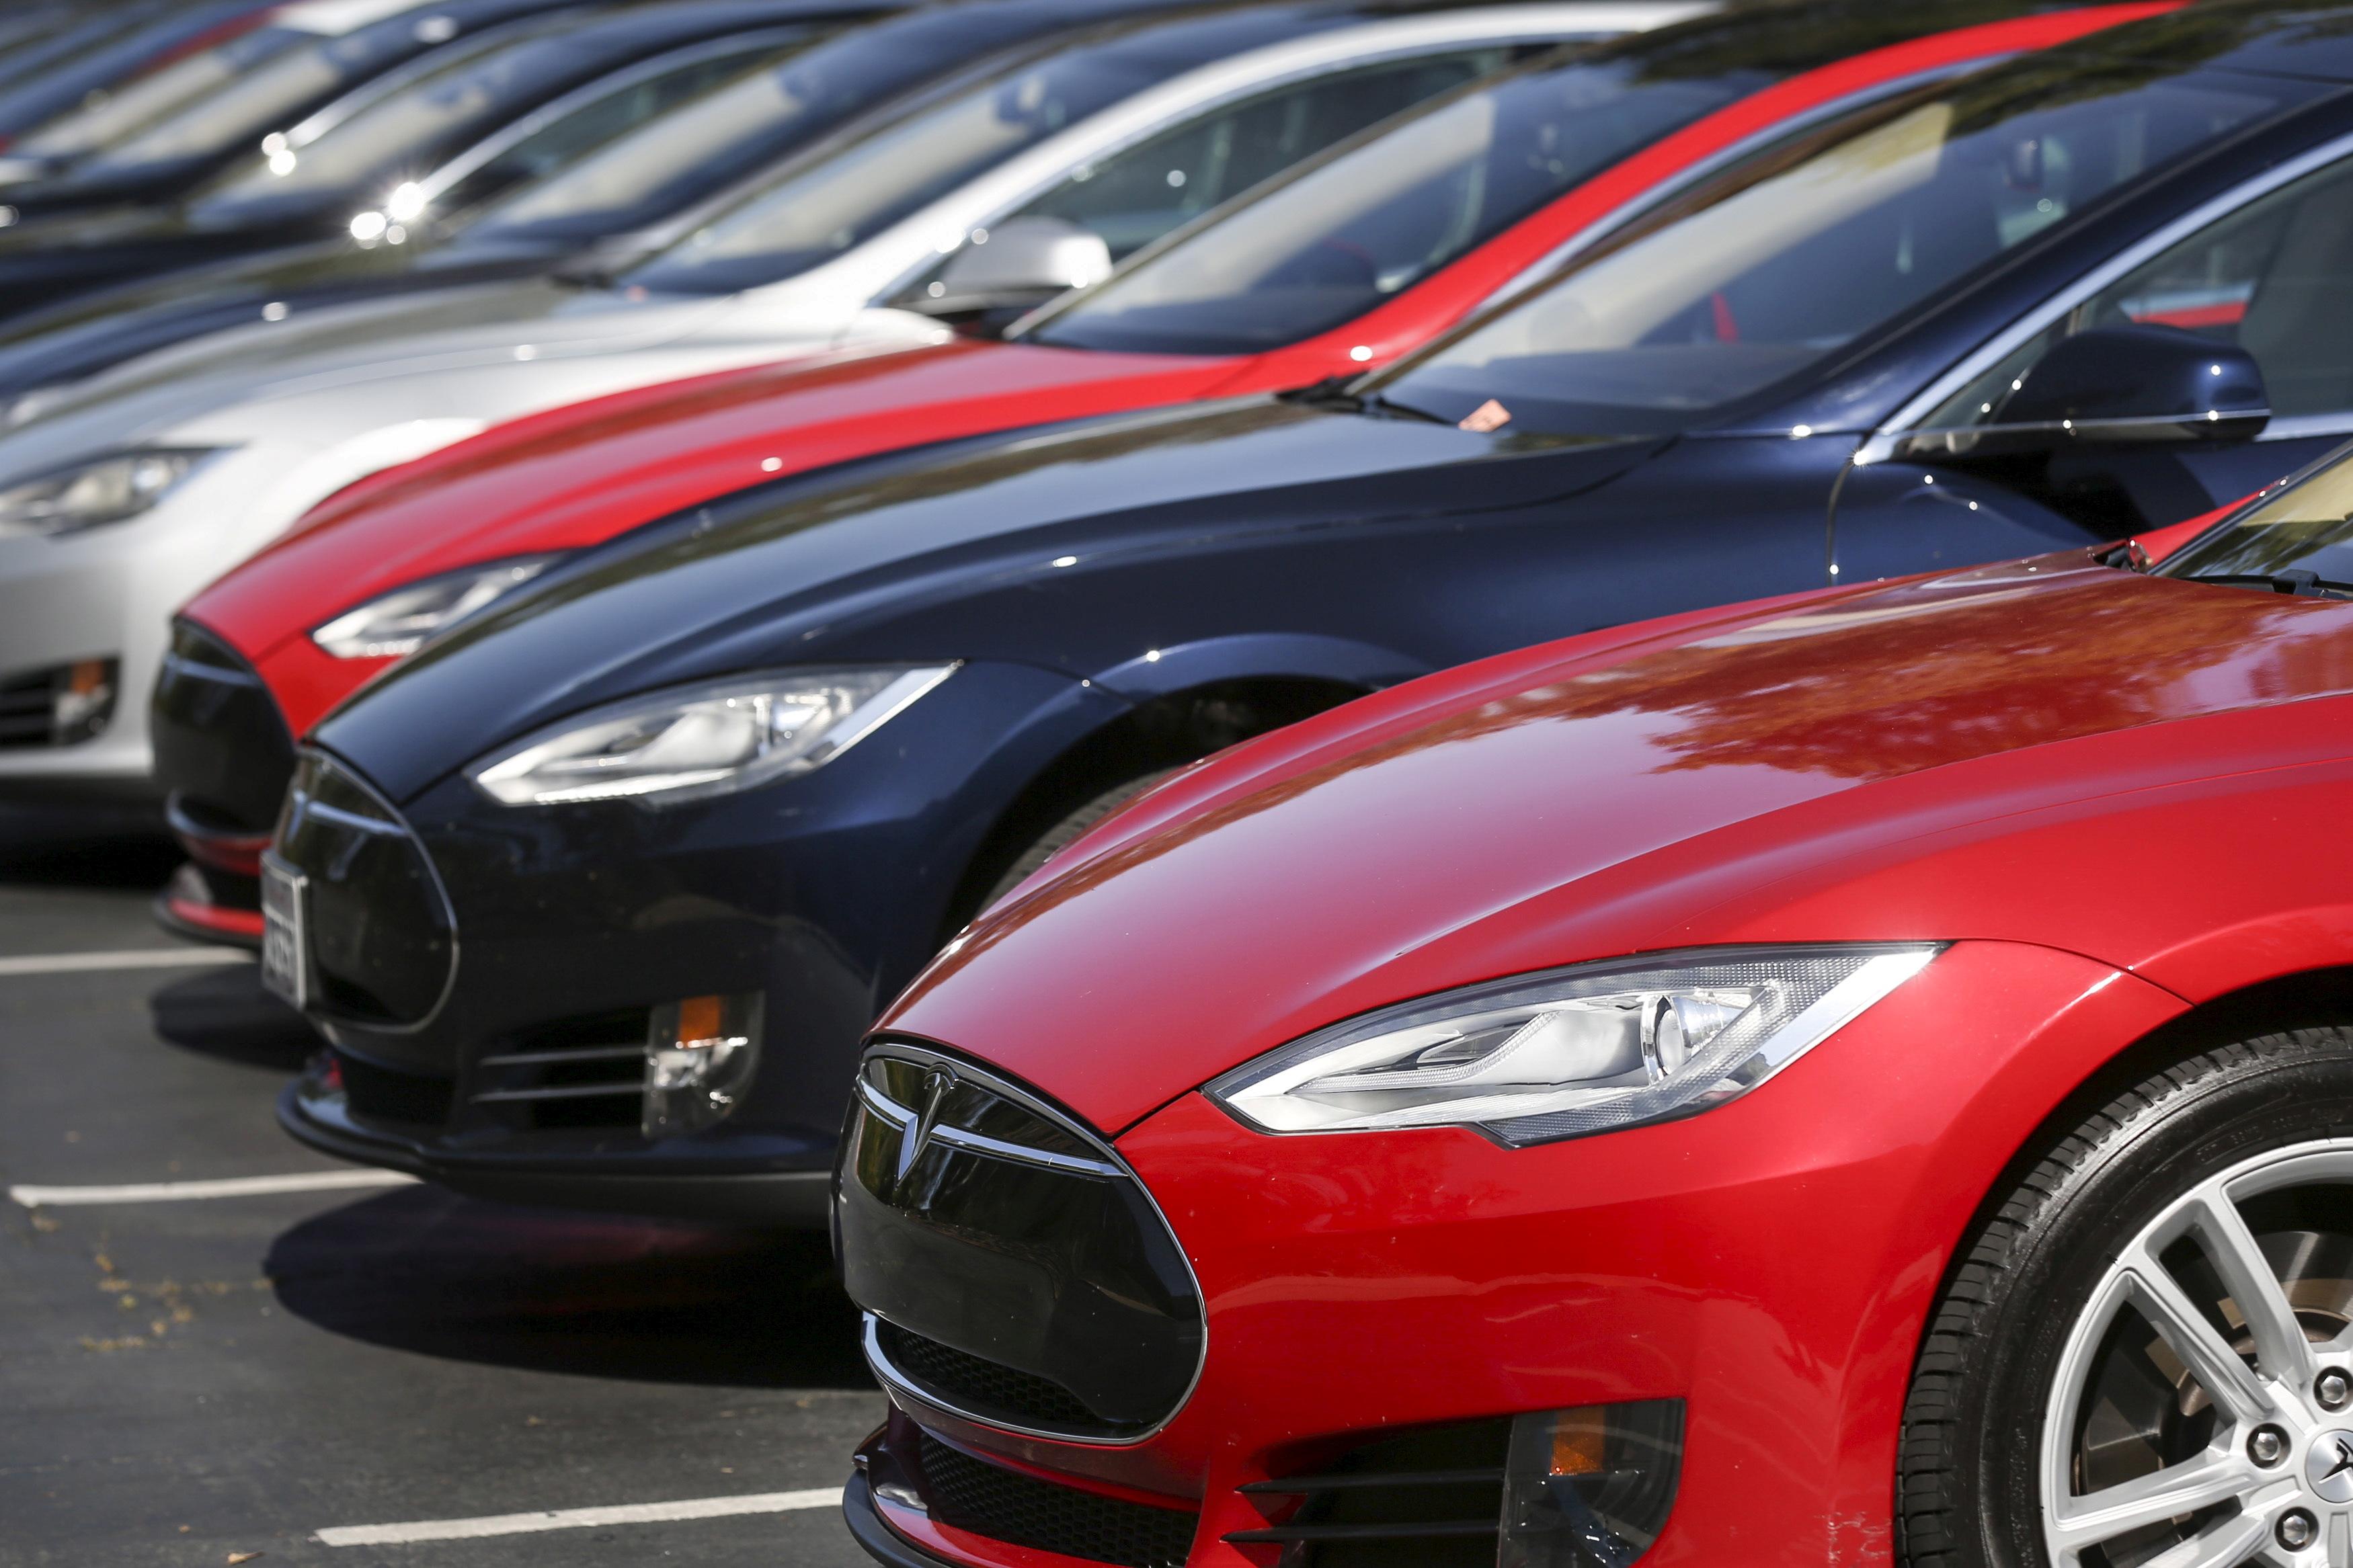 A row of Tesla Model S sedans are seen outside the company's headquarters in Palo Alto, California April 30, 2015. REUTERS/Elijah Nouvelage